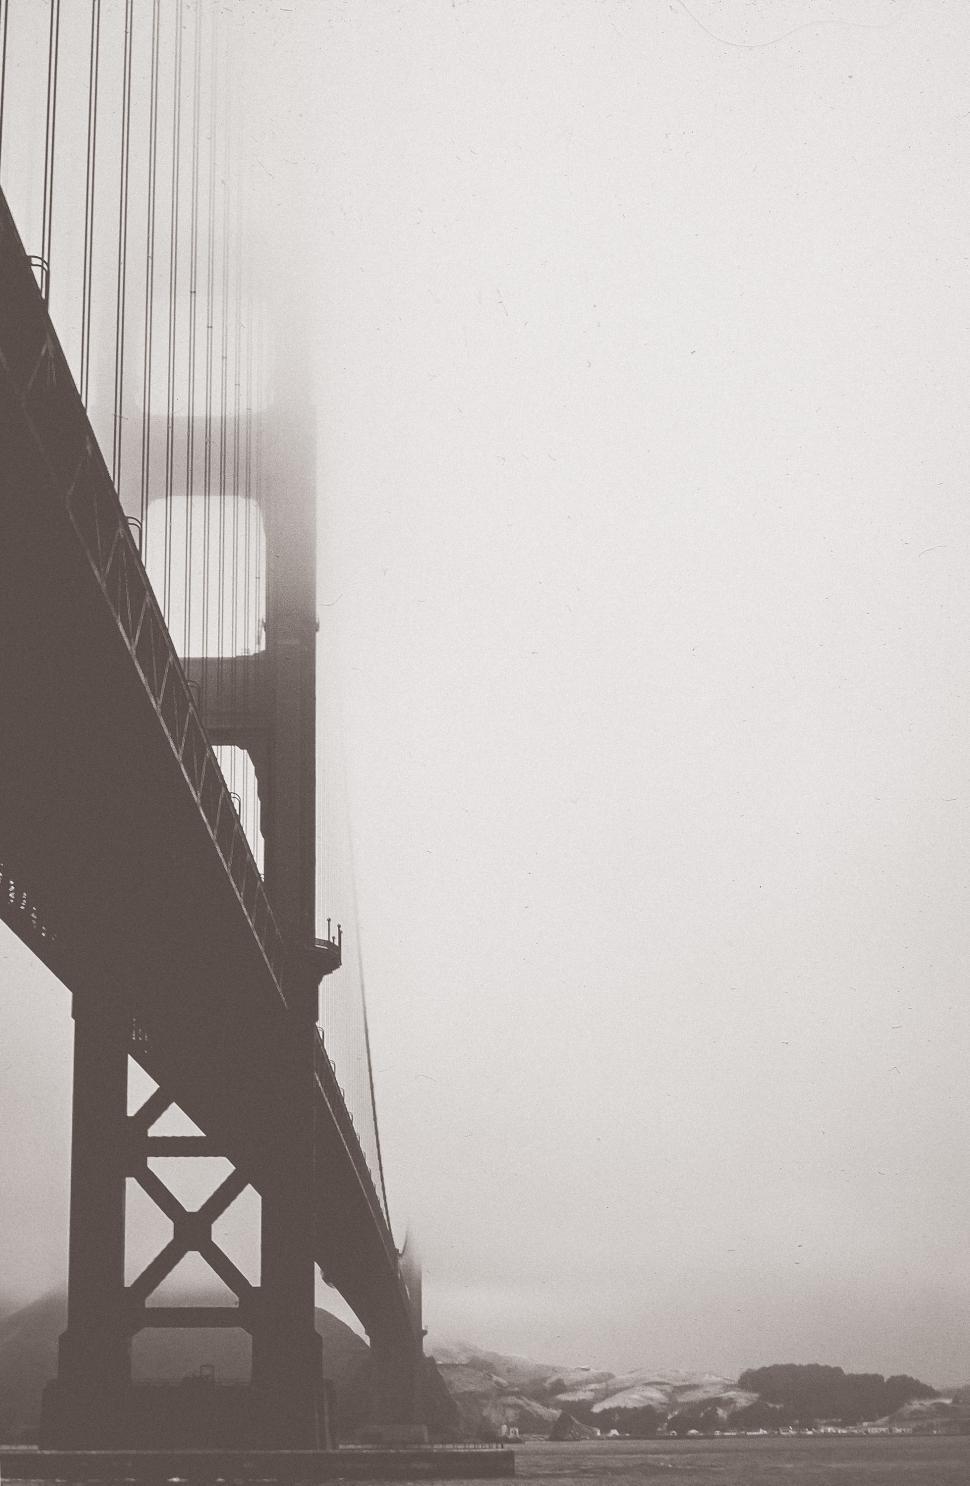 Download Free Stock Photo of Golden Gate Bridge, San Francisco